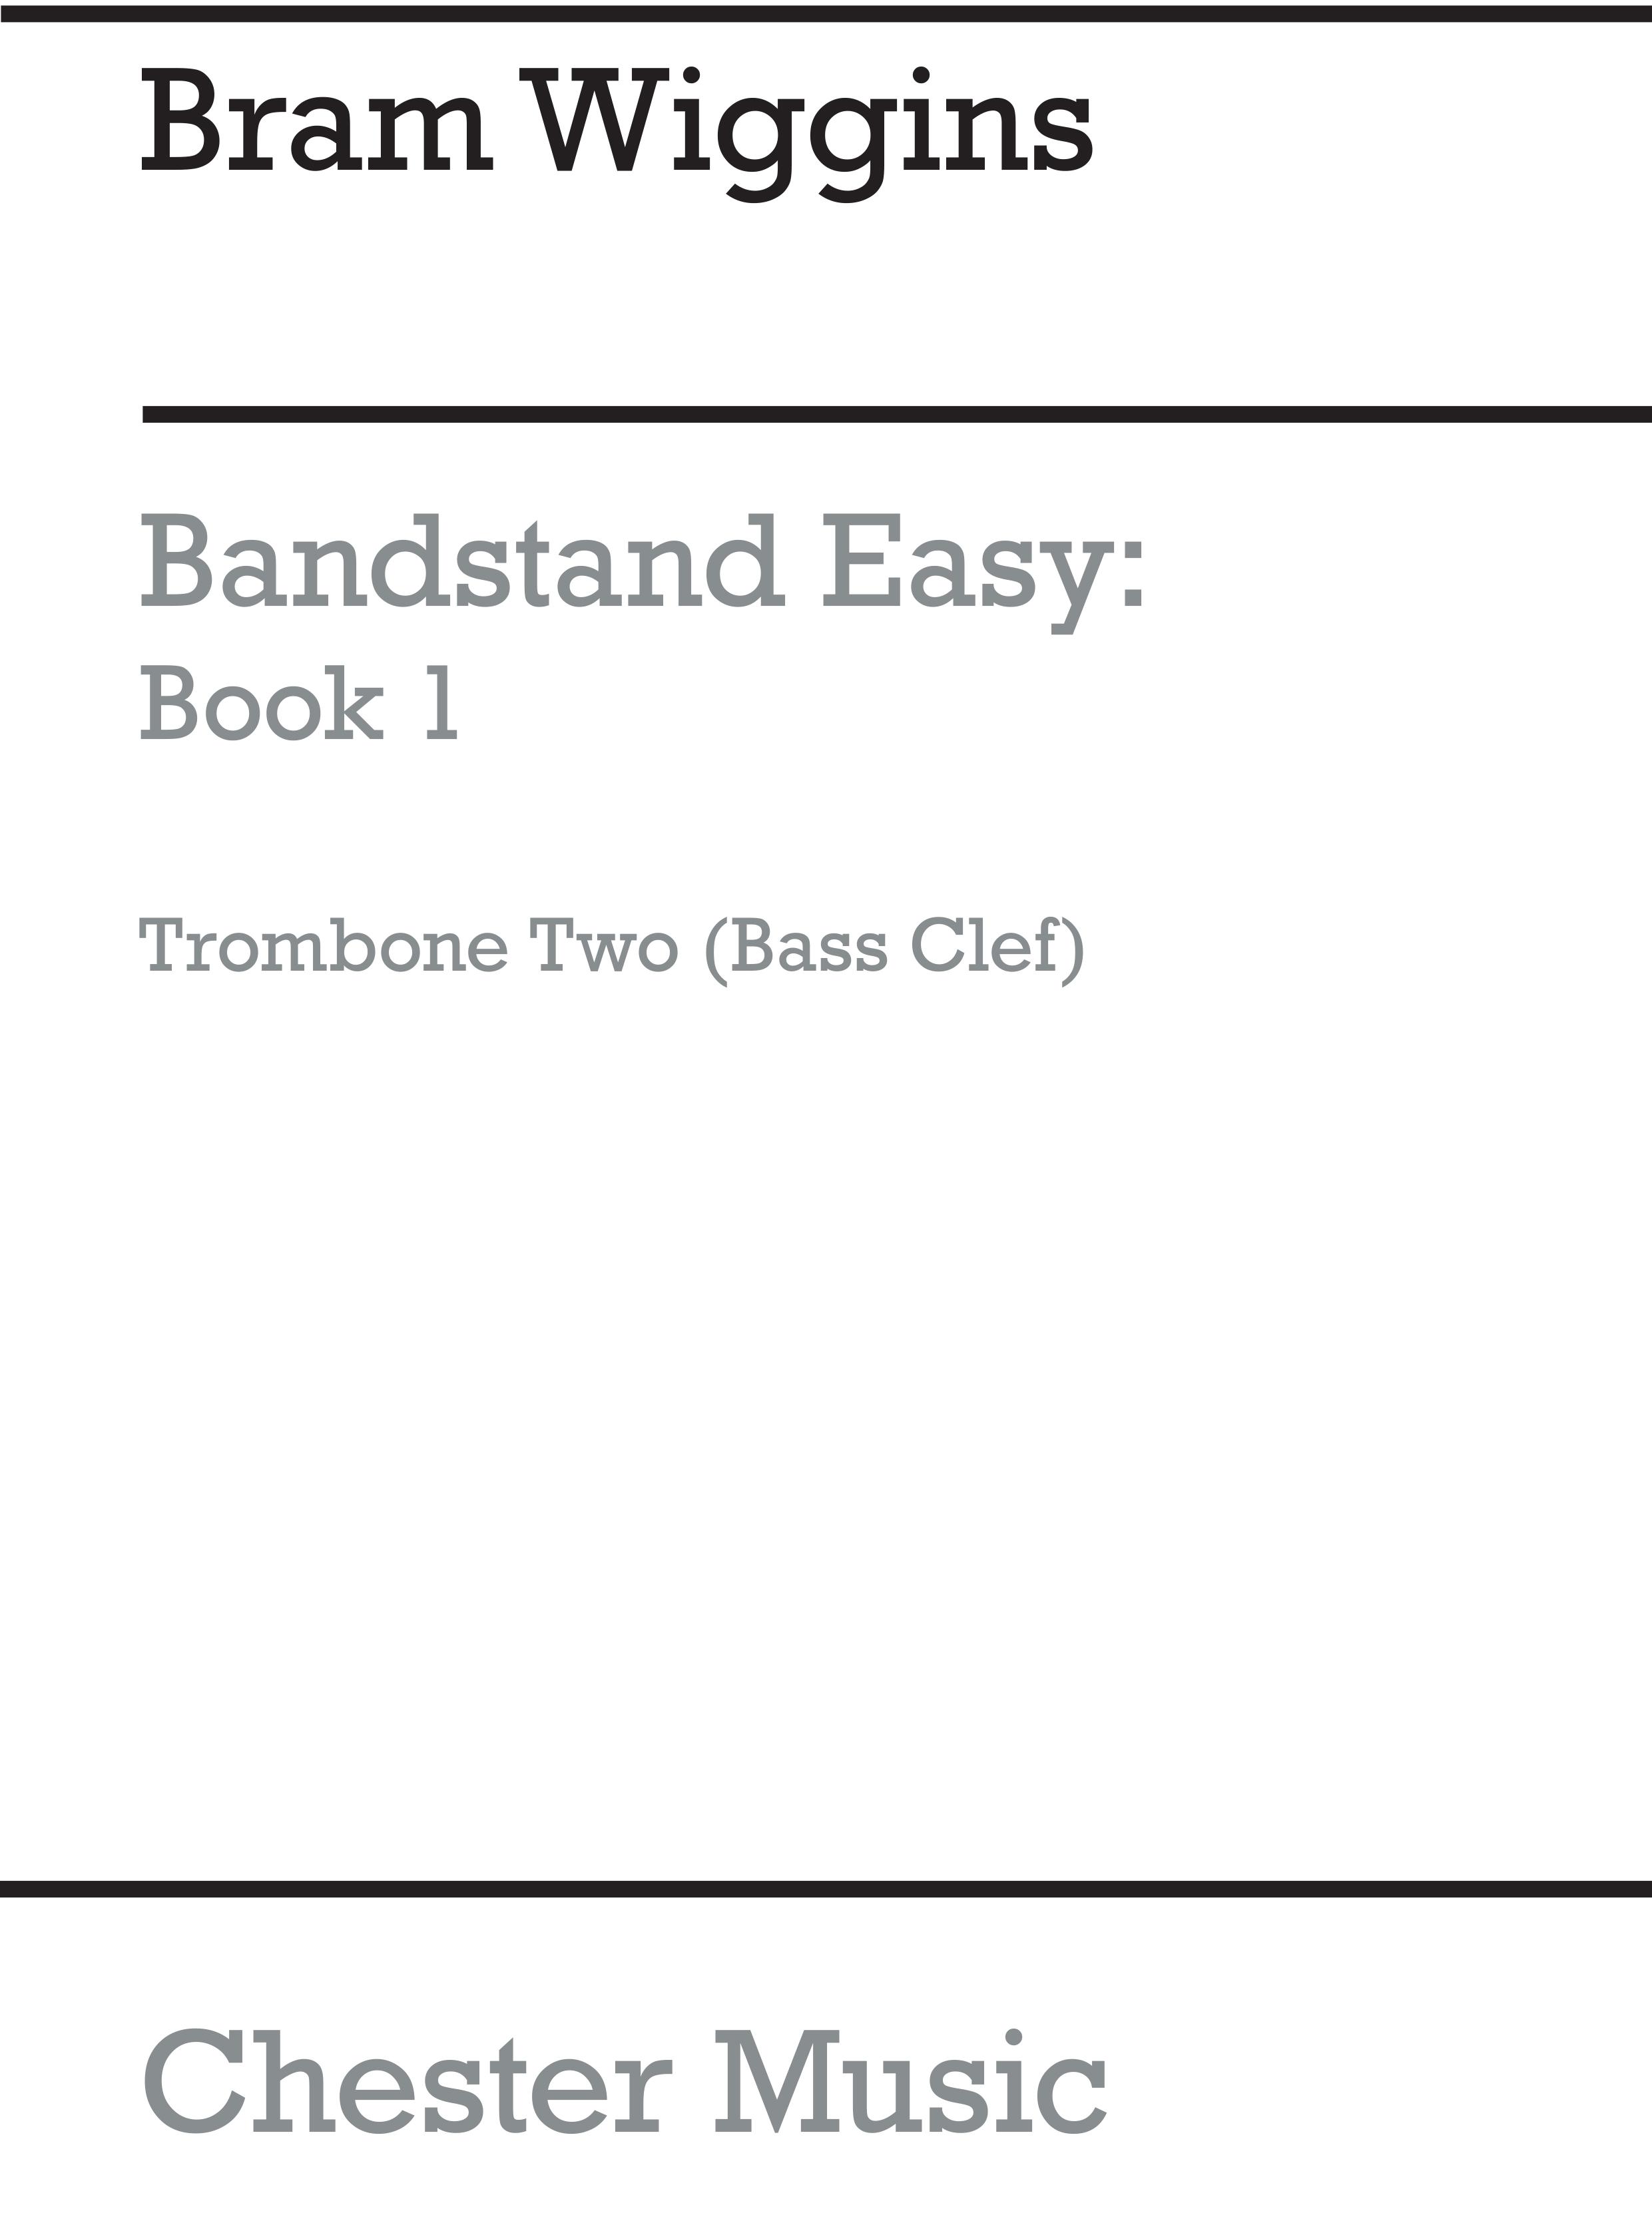 Bram Wiggins: Bandstand Easy Book 1 (Trombone 2 BC): Concert Band: Part